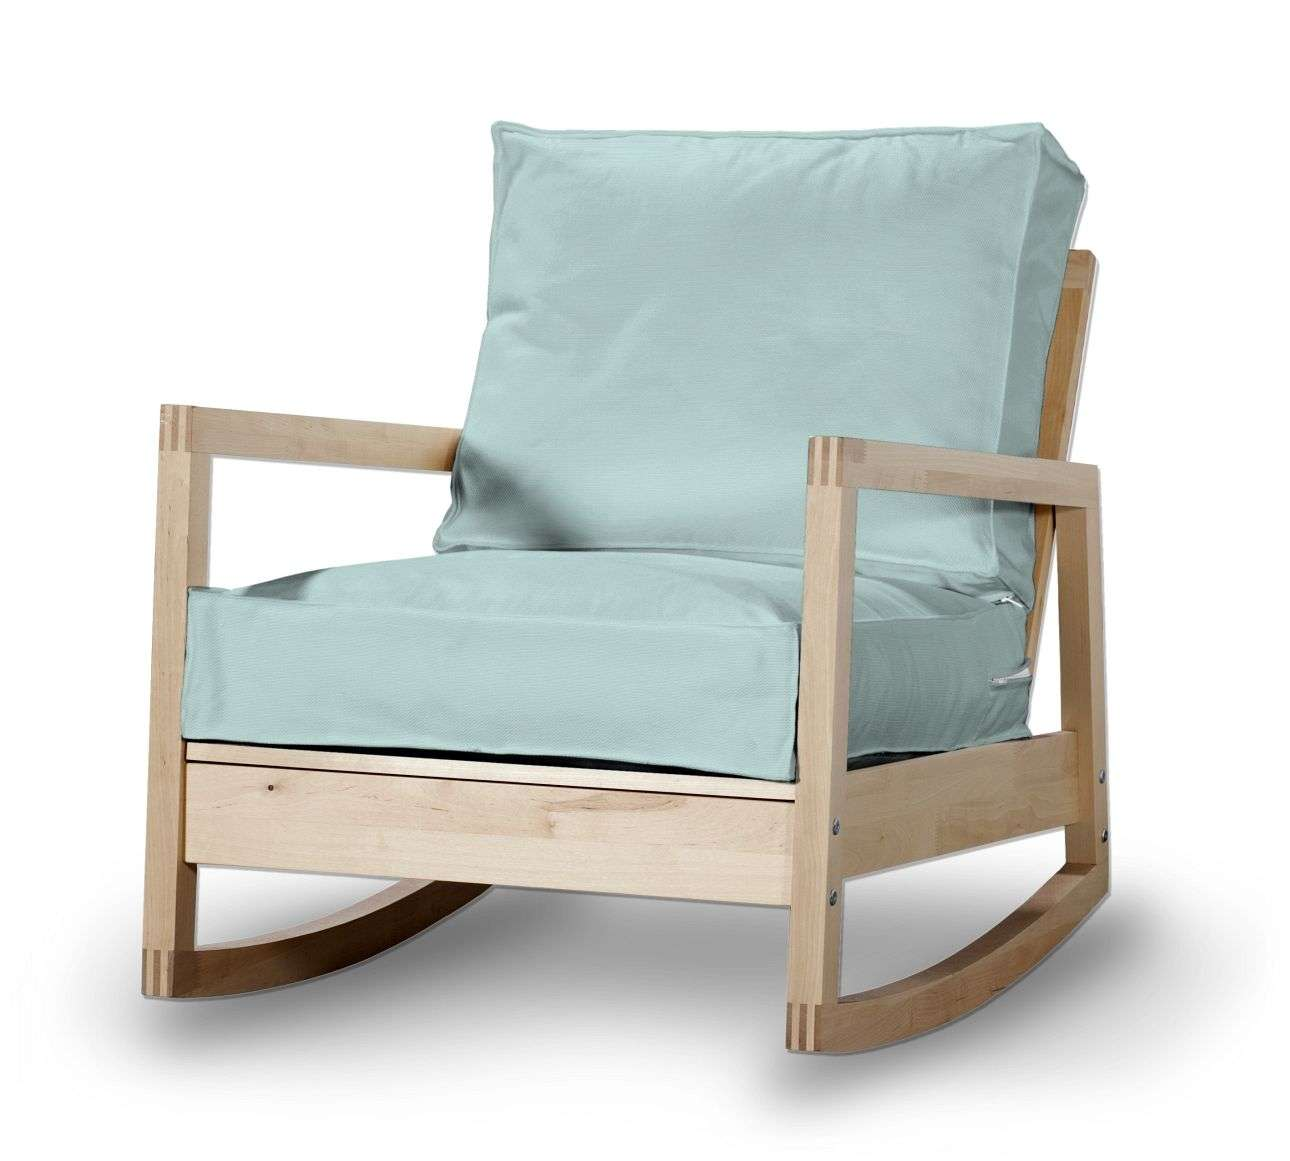 Pokrowiec na fotel Lillberg Fotel Lillberg w kolekcji Cotton Panama, tkanina: 702-10